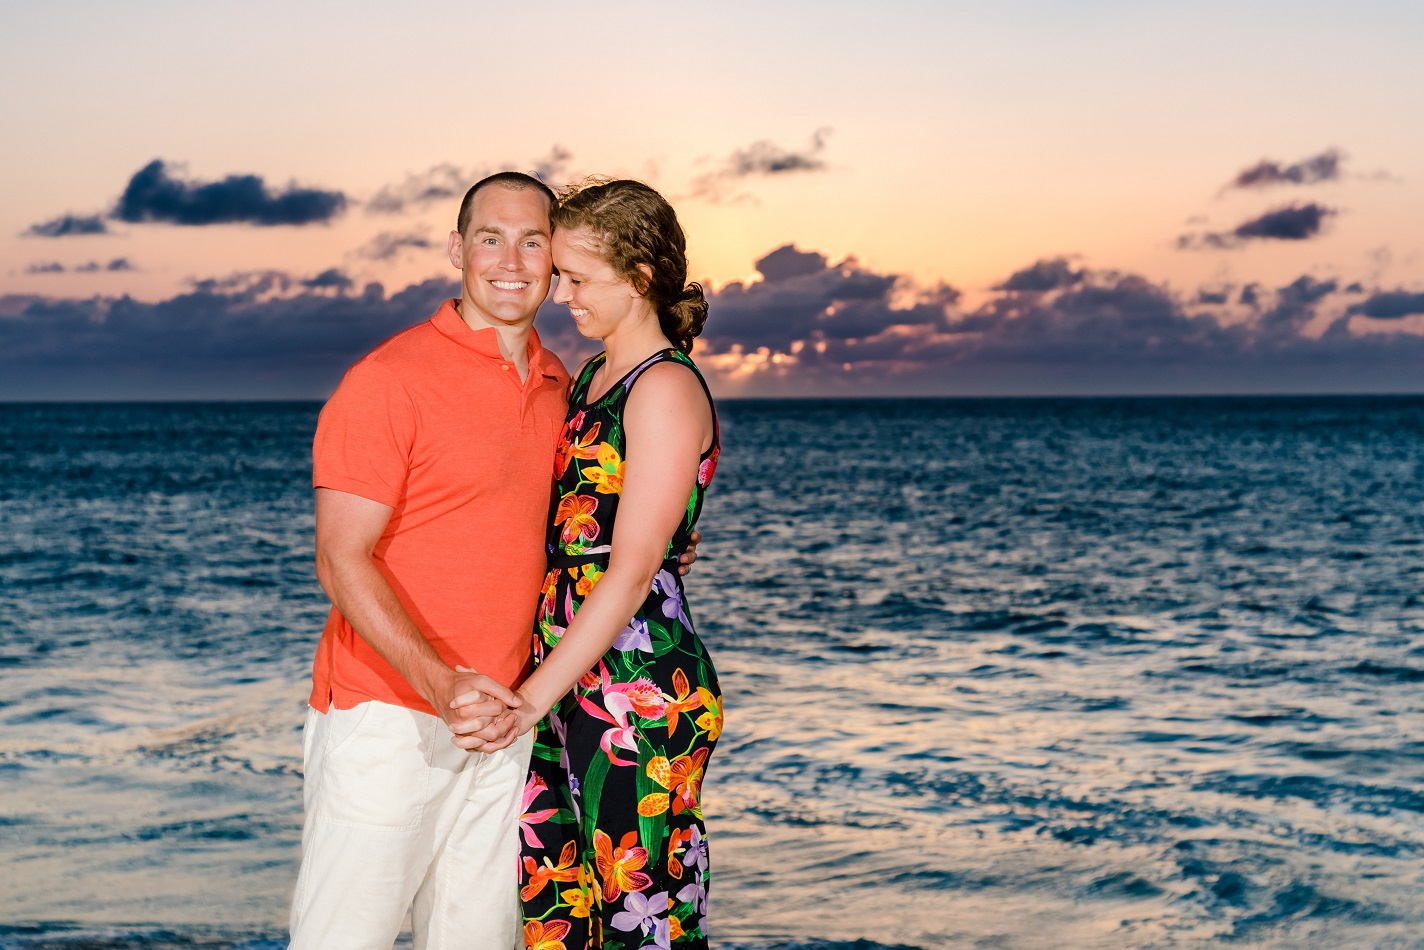 couples sunset beach engagement photo